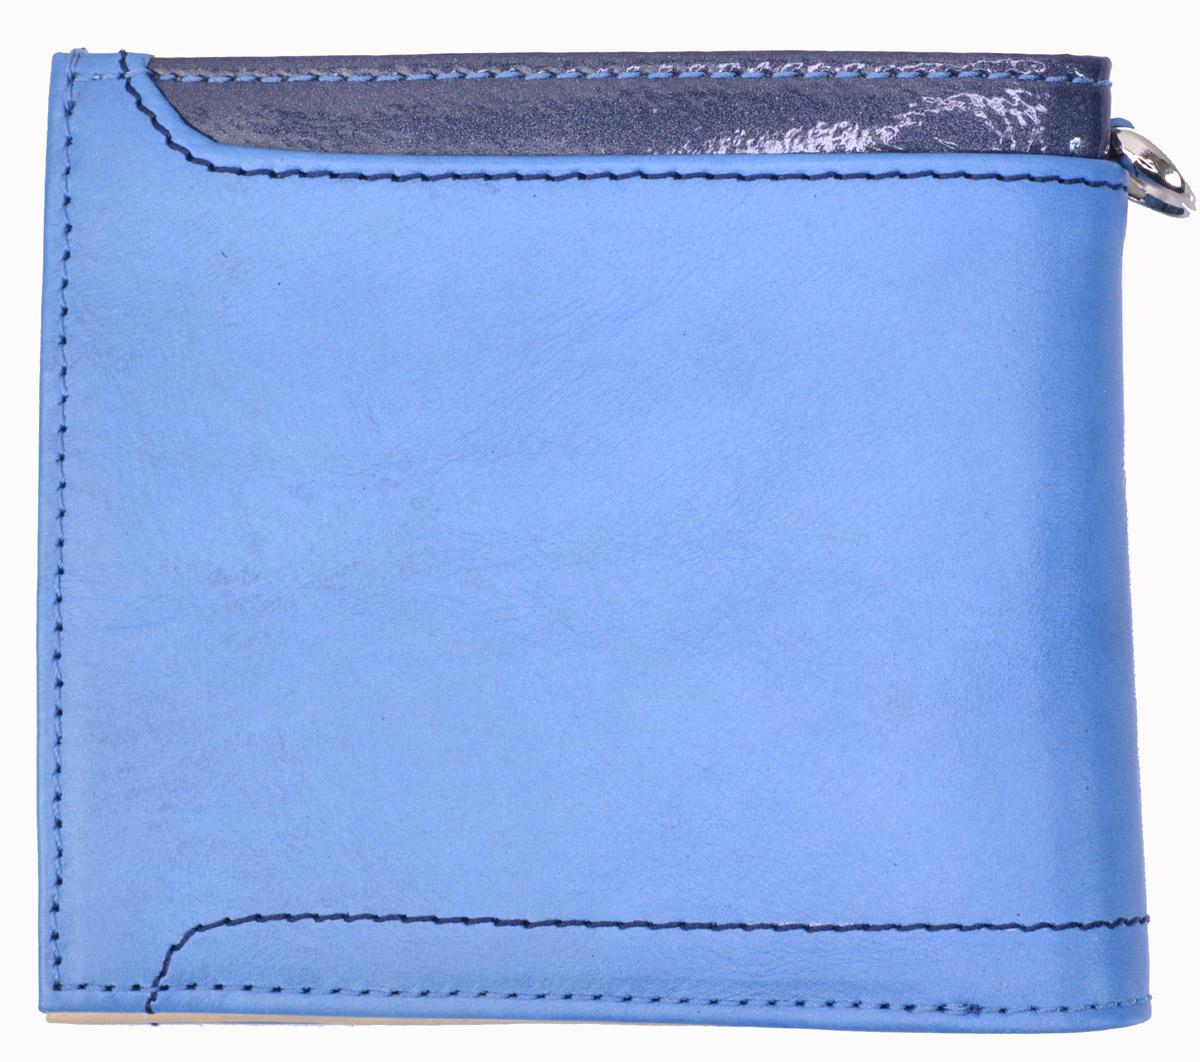 http://www.police.ne.jp/images/police-axis-wallet-2_blue_13.jpg